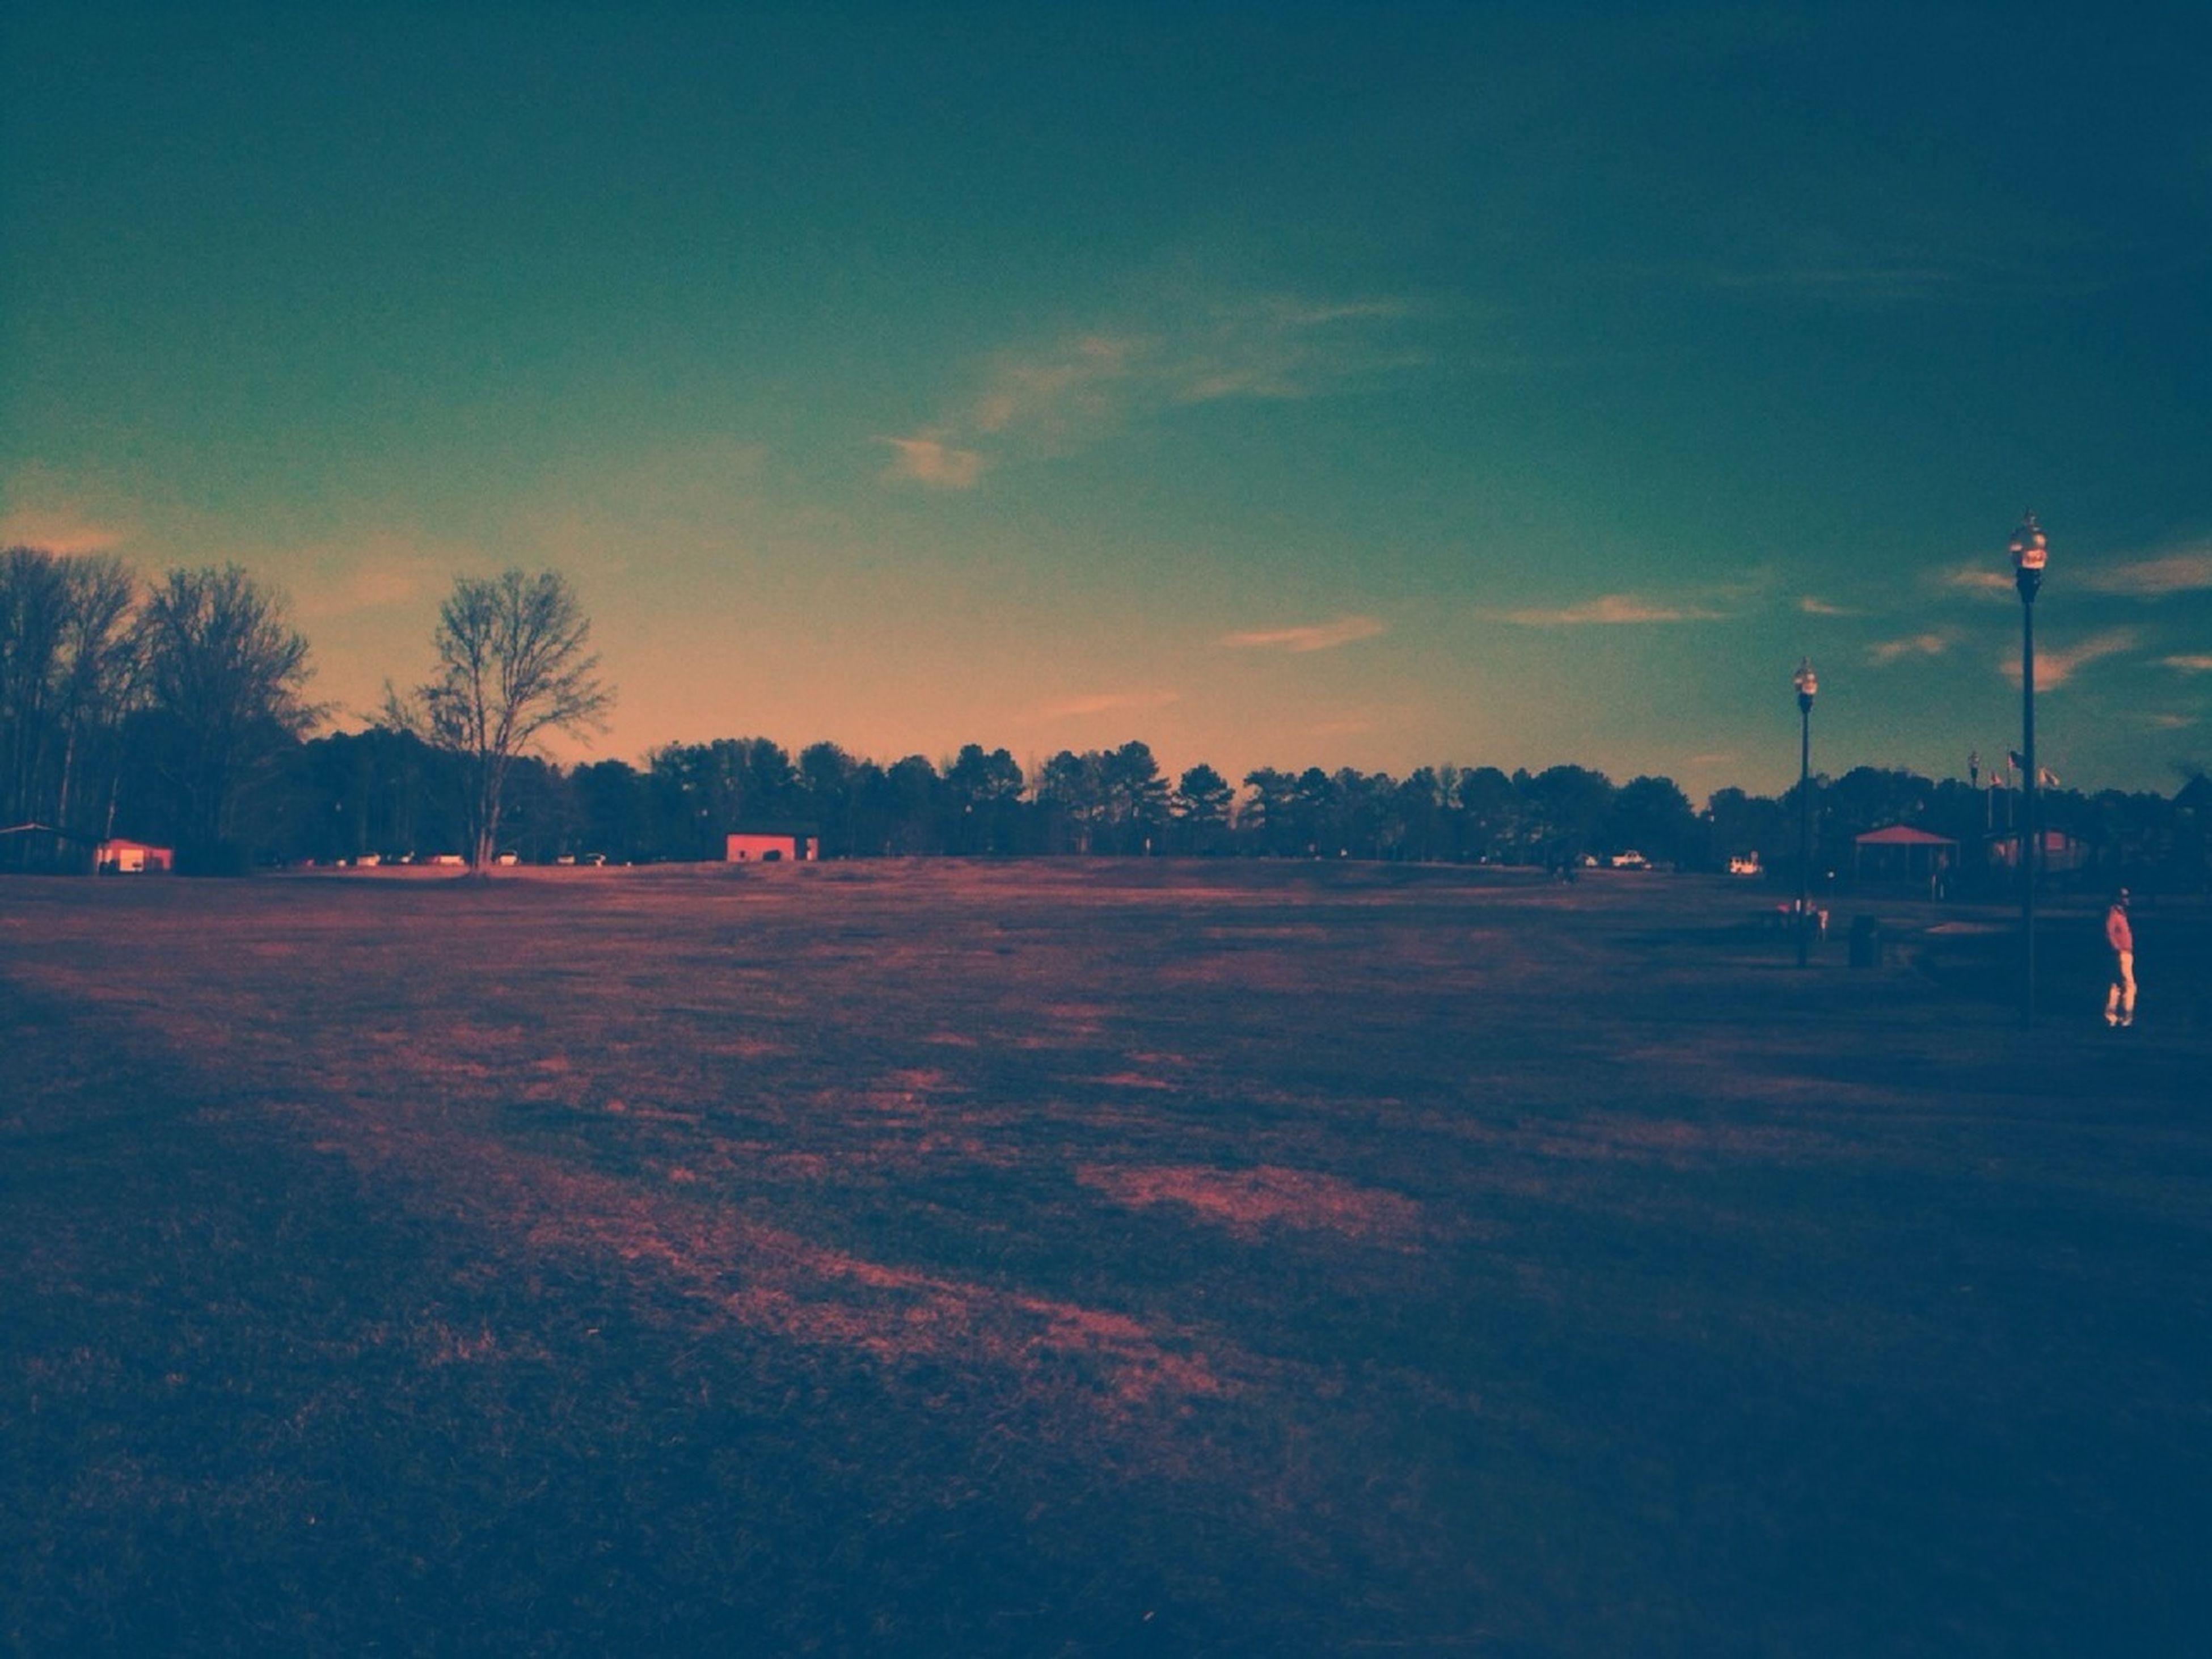 transportation, sky, tree, road, car, land vehicle, street light, illuminated, mode of transport, street, sunset, dusk, outdoors, cloud - sky, blue, no people, landscape, field, road marking, night